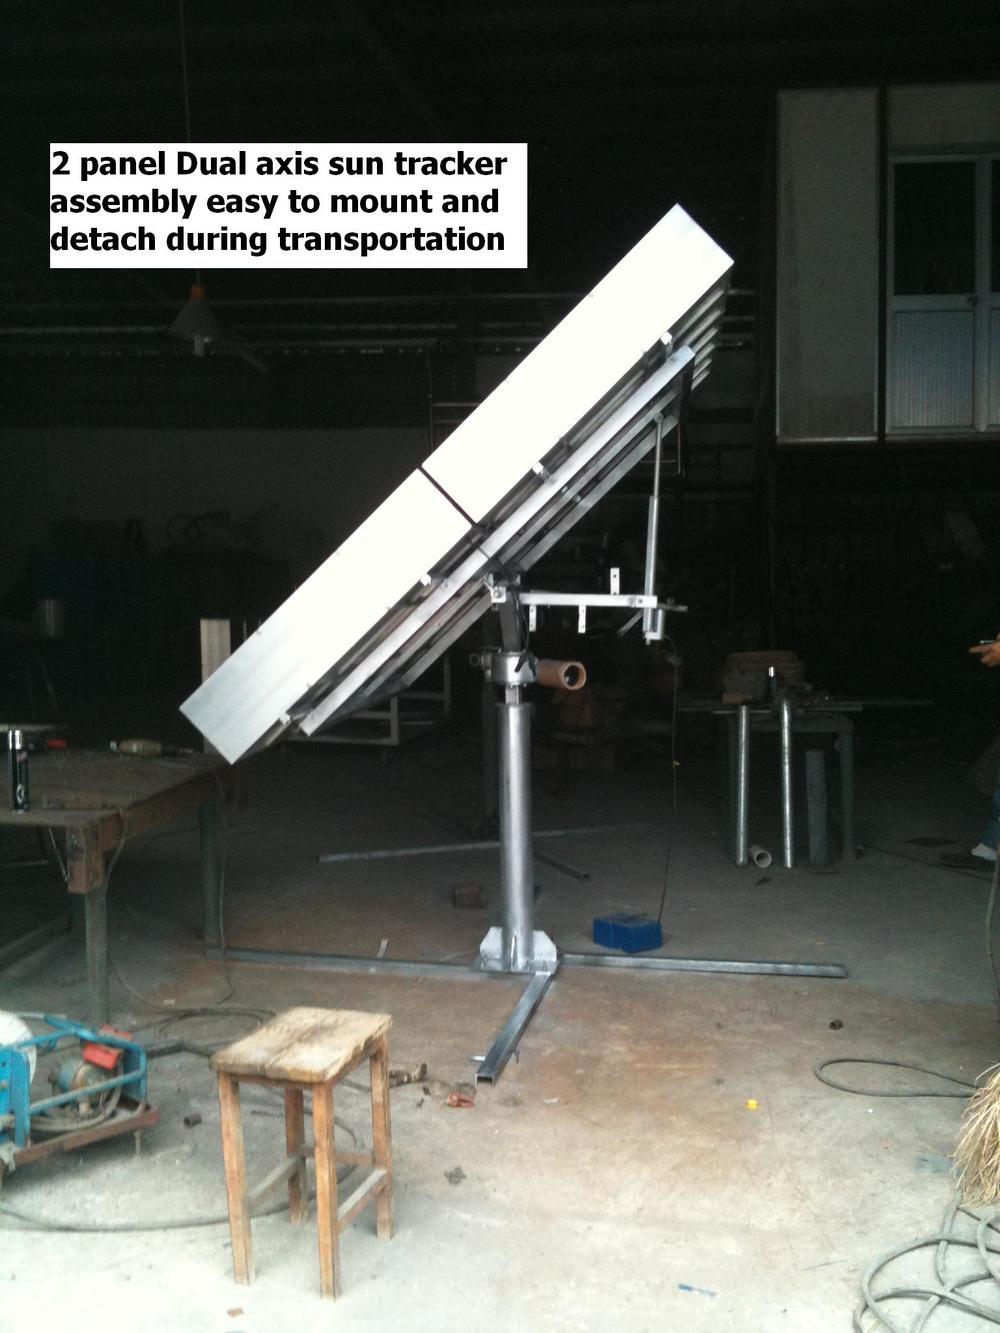 2 panel hcpv array upload bigger